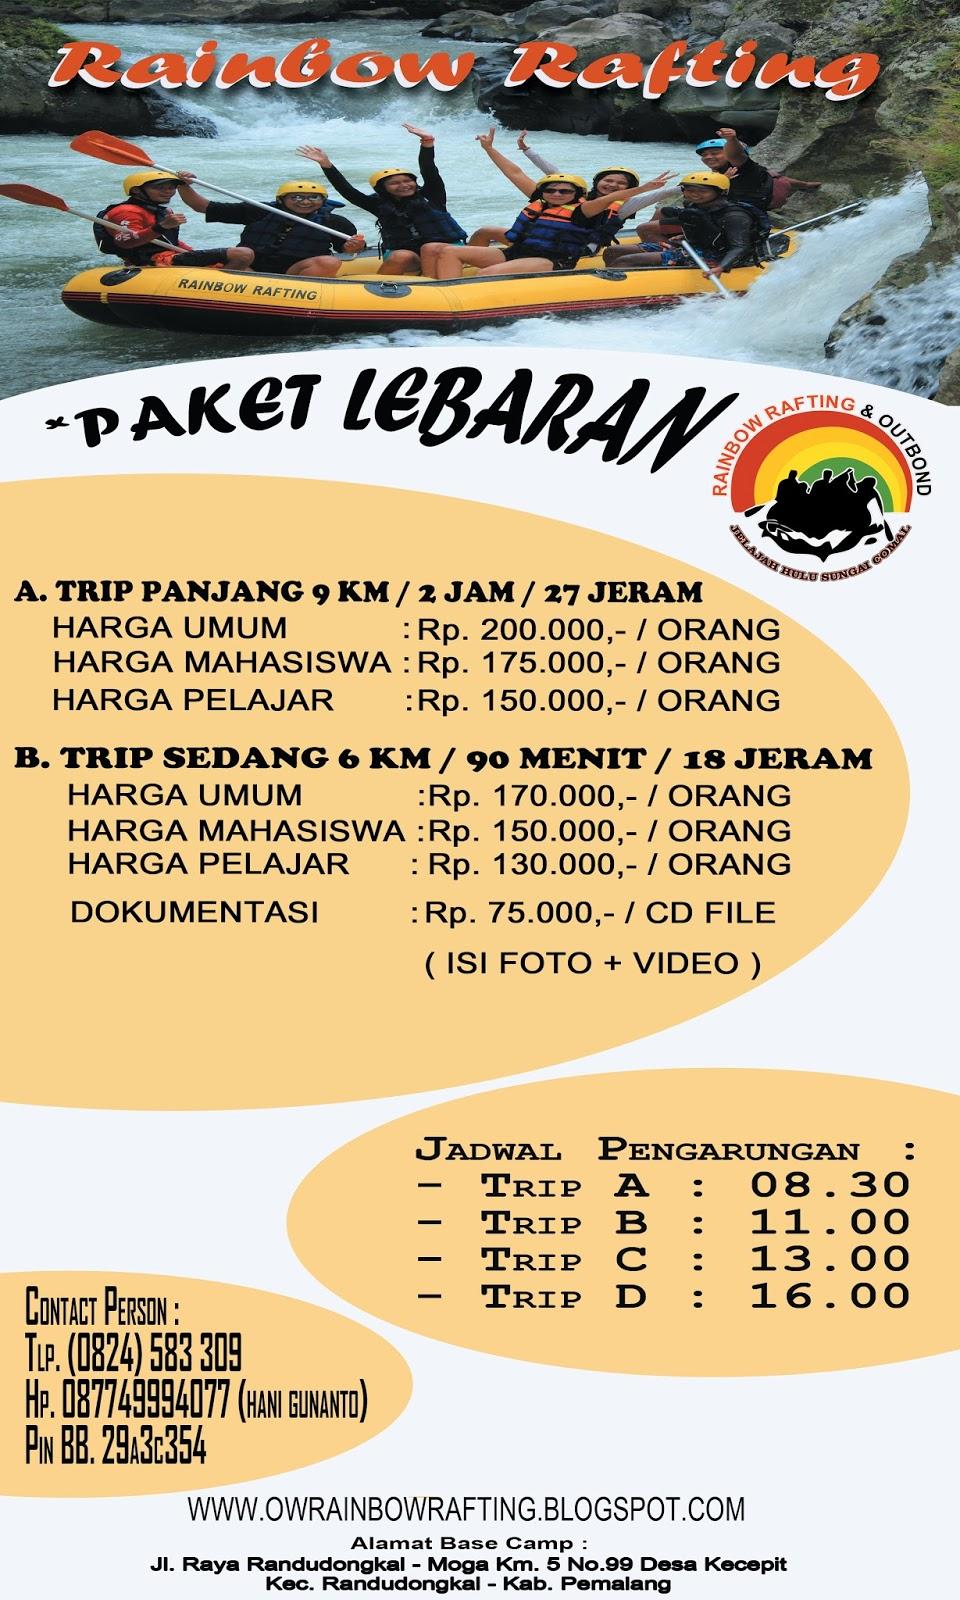 Wisata Arung Jeram Jelajah Hulu Sungai Comal 2015